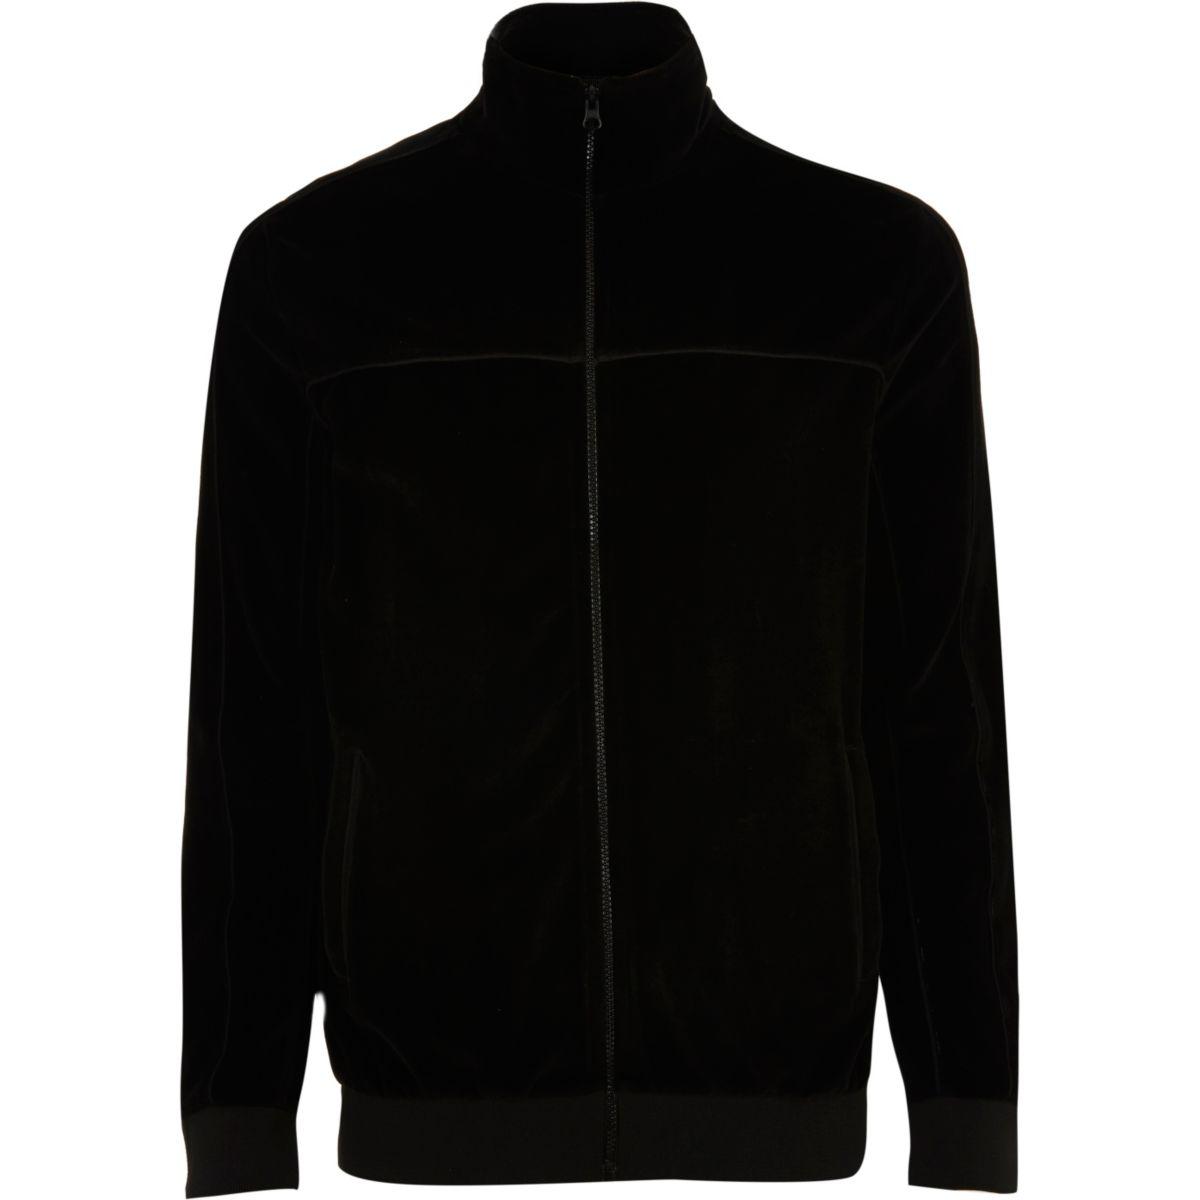 Black velour track jacket